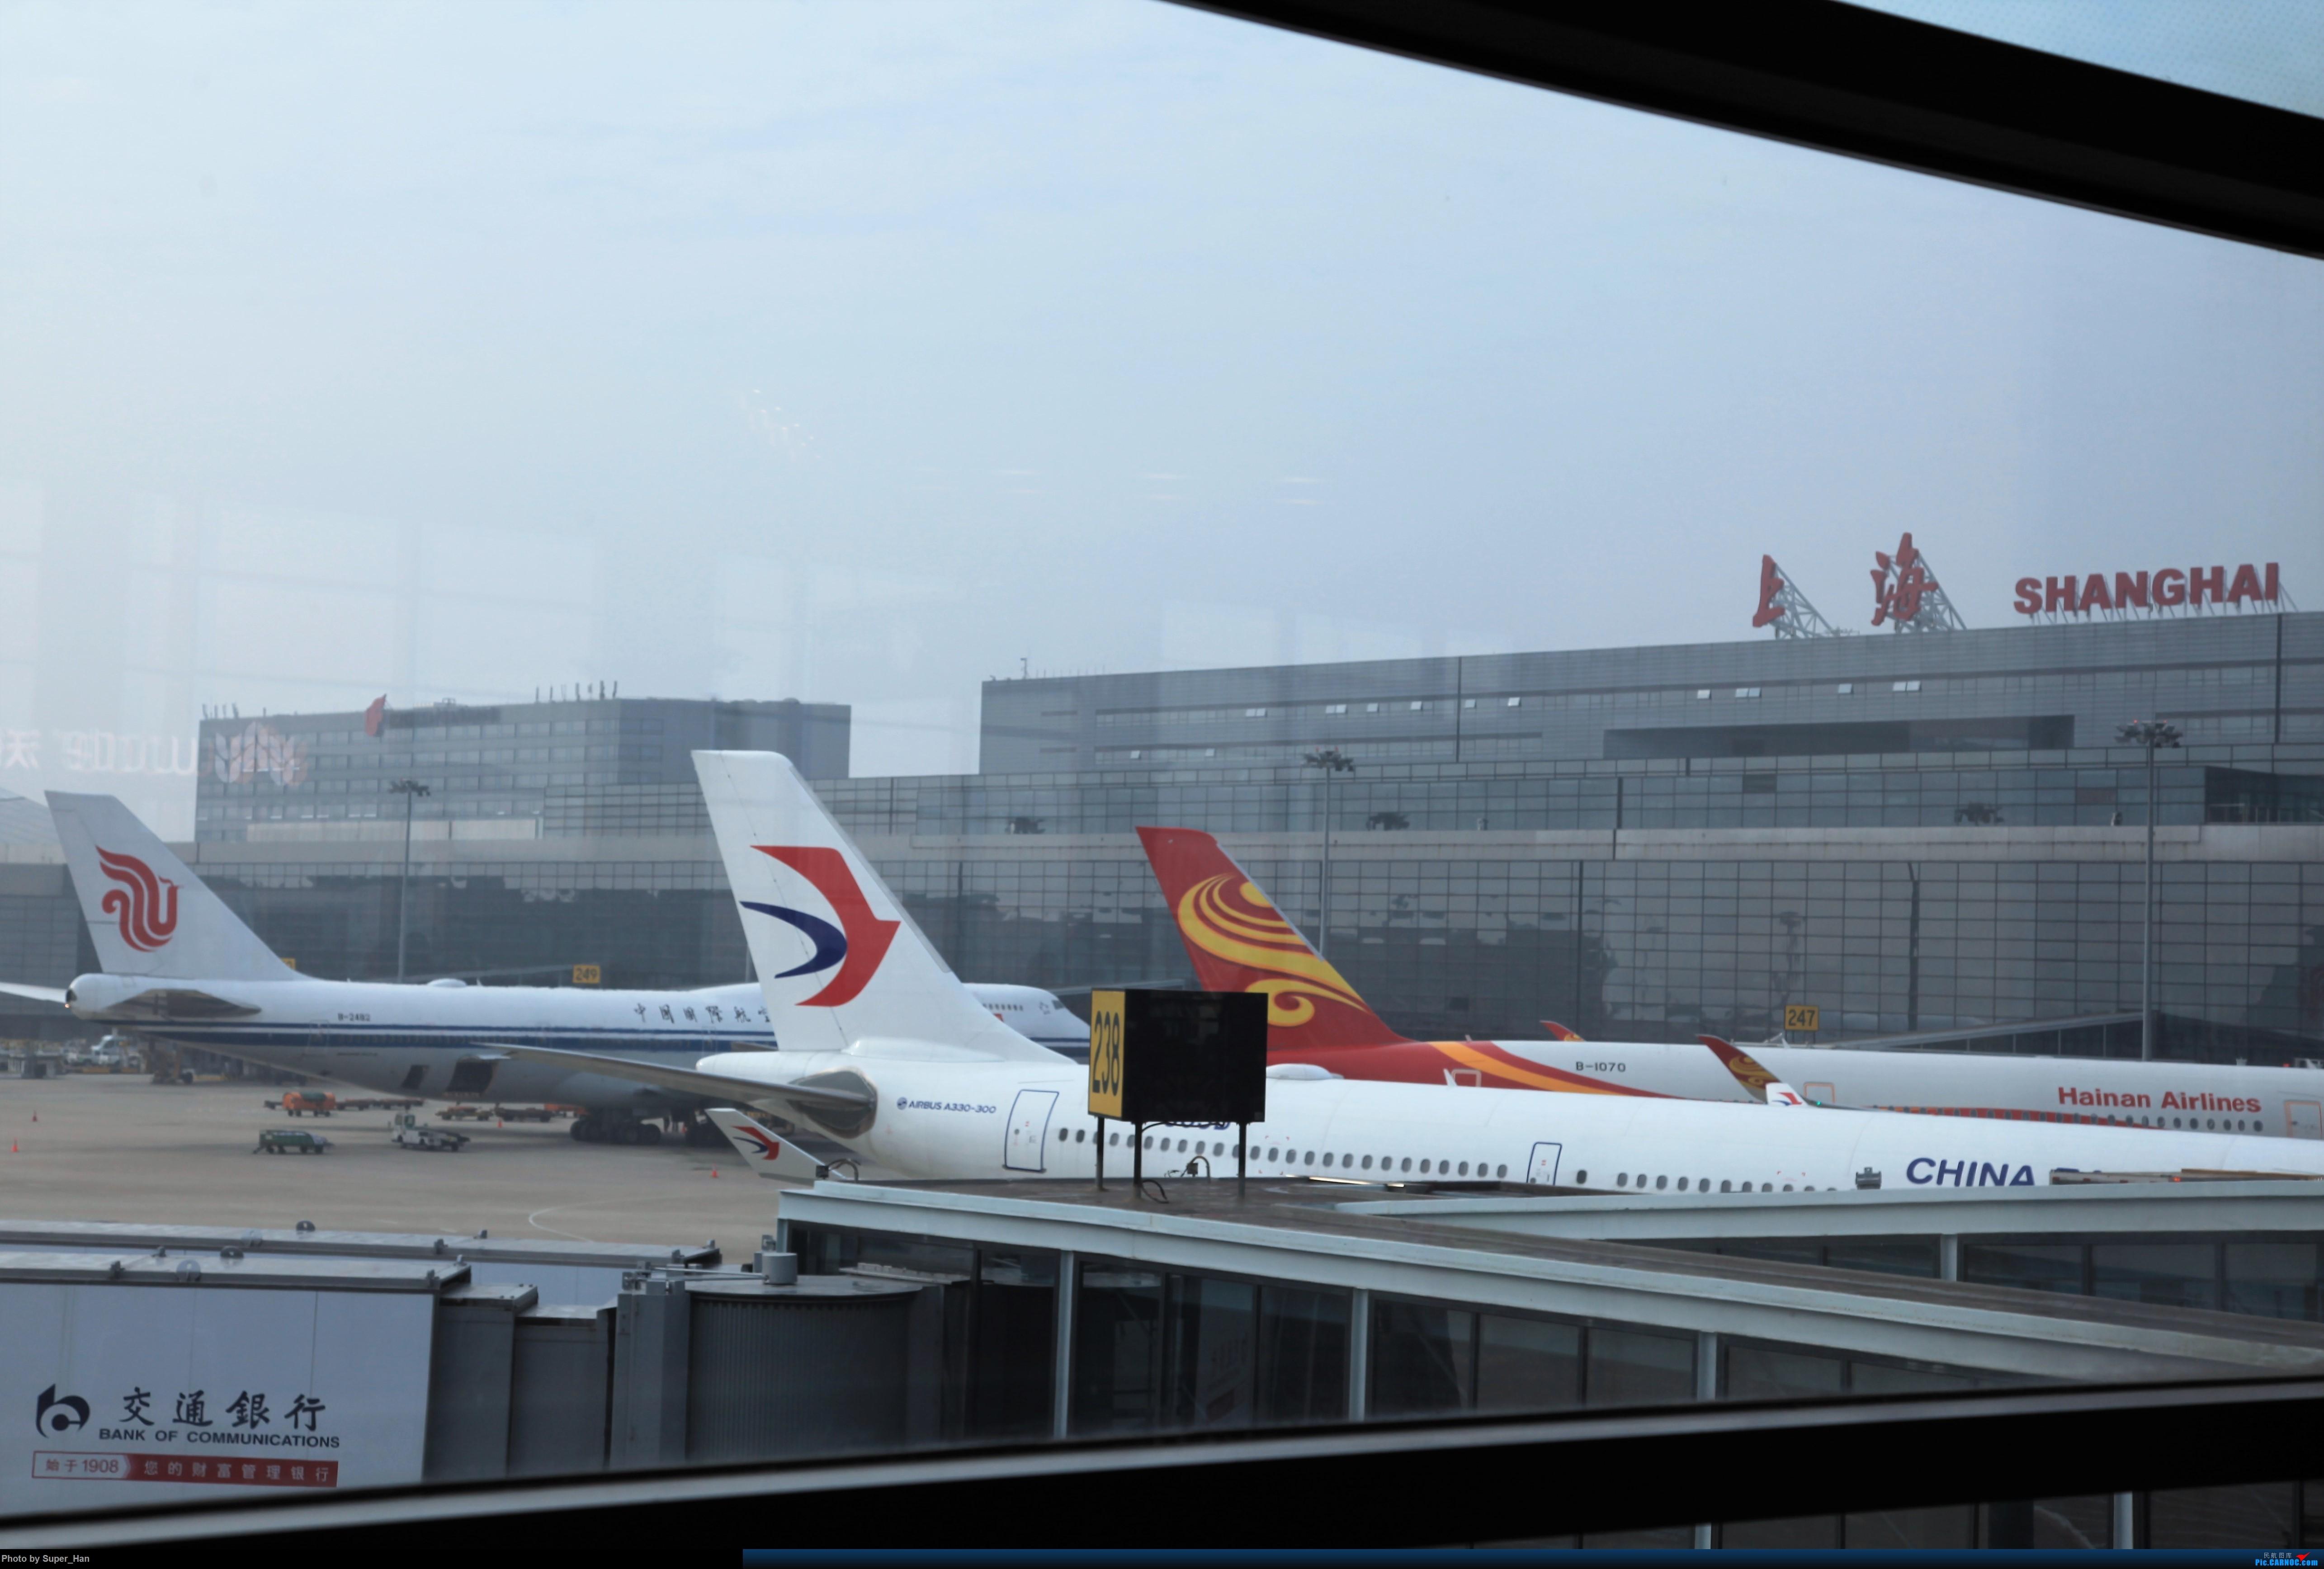 Re:[原创]2019虹桥出发飞北京第一拍   中国上海虹桥国际机场 中国上海虹桥国际机场